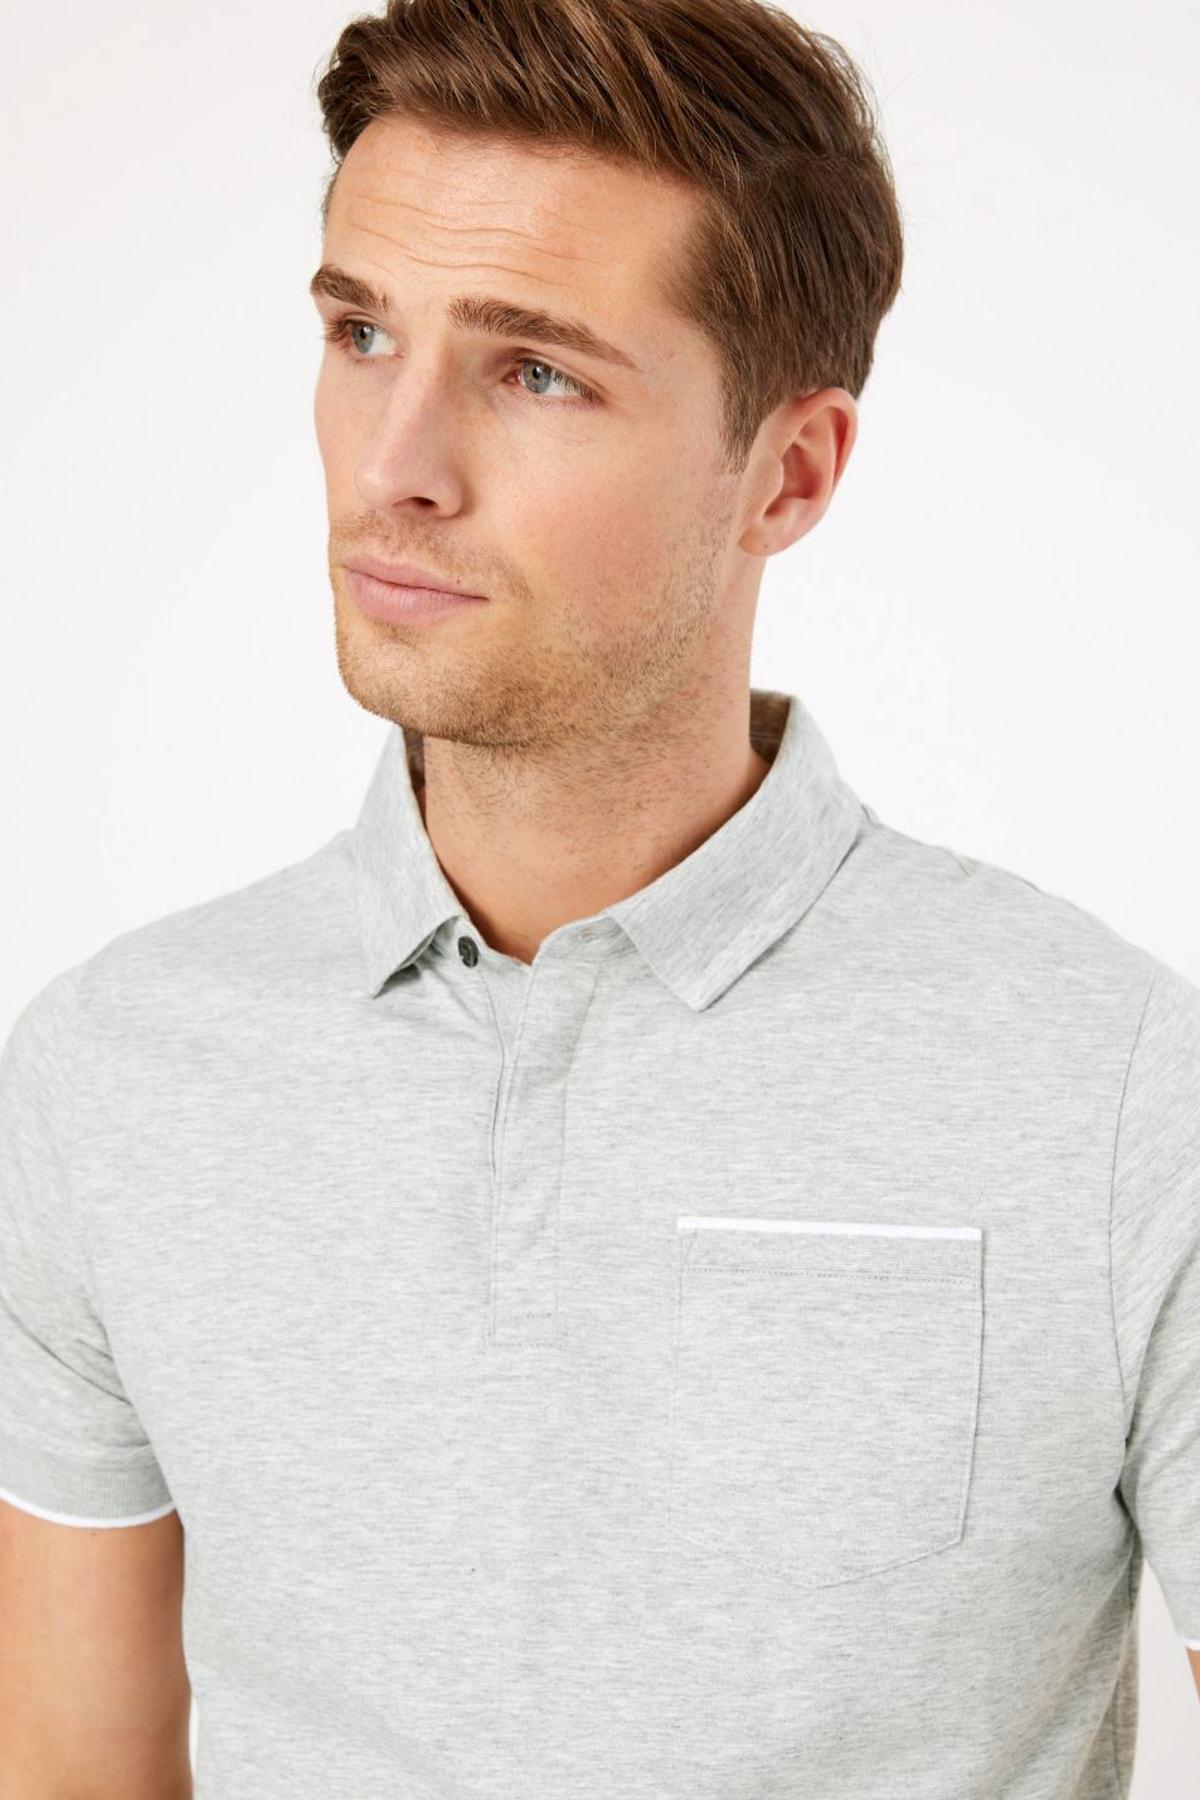 Marks & Spencer Erkek Gri Kısa Kollu Polo Yaka T-Shirt T28004885A 2